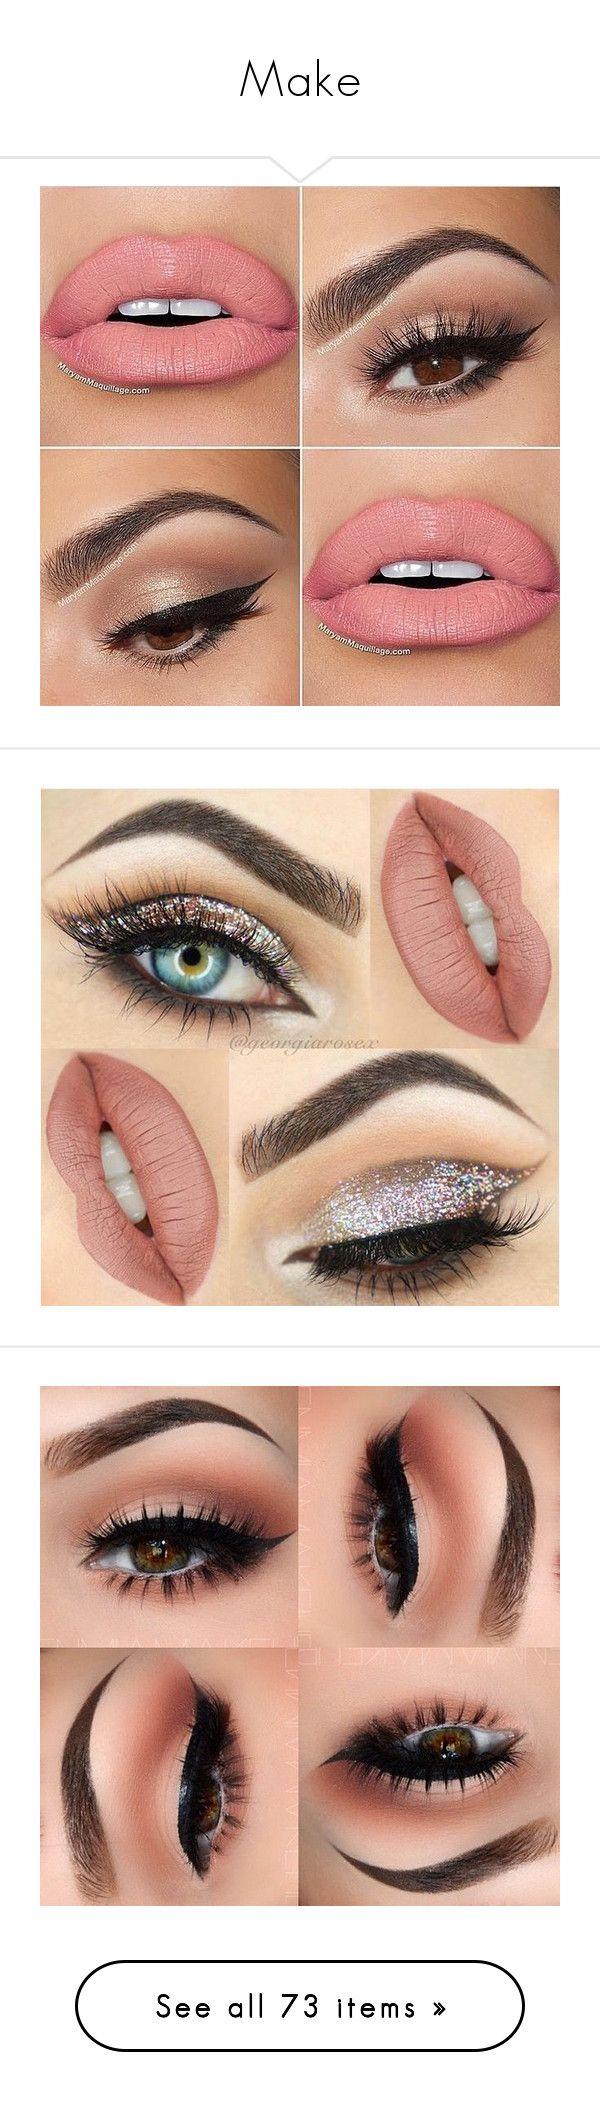 """Make"" by gabriel-sampaiooo on Polyvore featuring beauty products, makeup, lip makeup, eyes, lip, make, lips, beauty, eye makeup e filler"